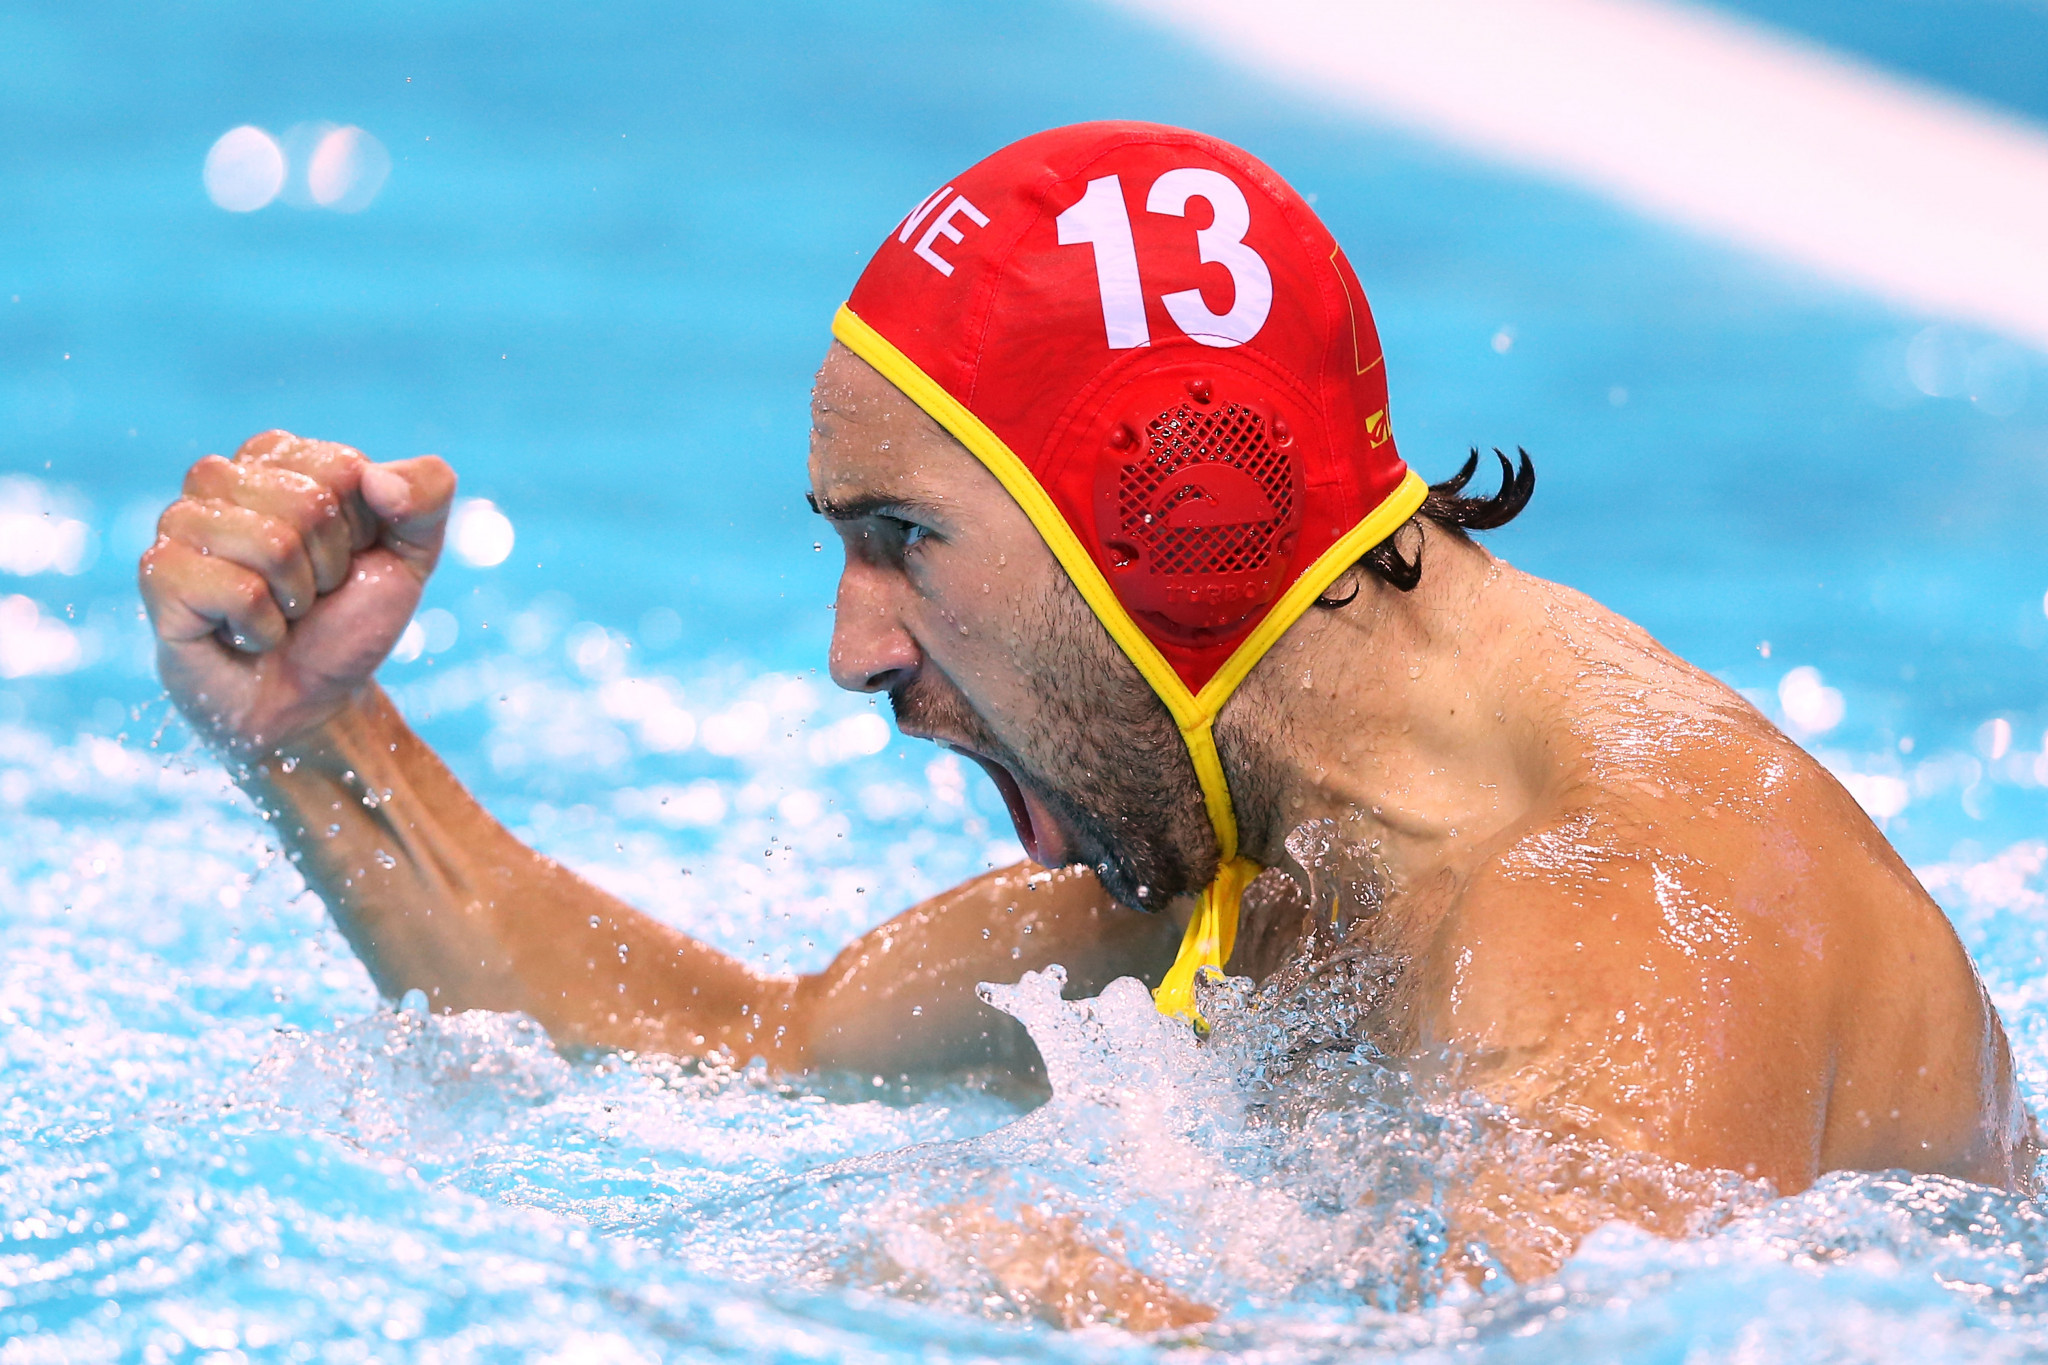 Montenegro to face Greece in Men's Water Polo League semi-finals